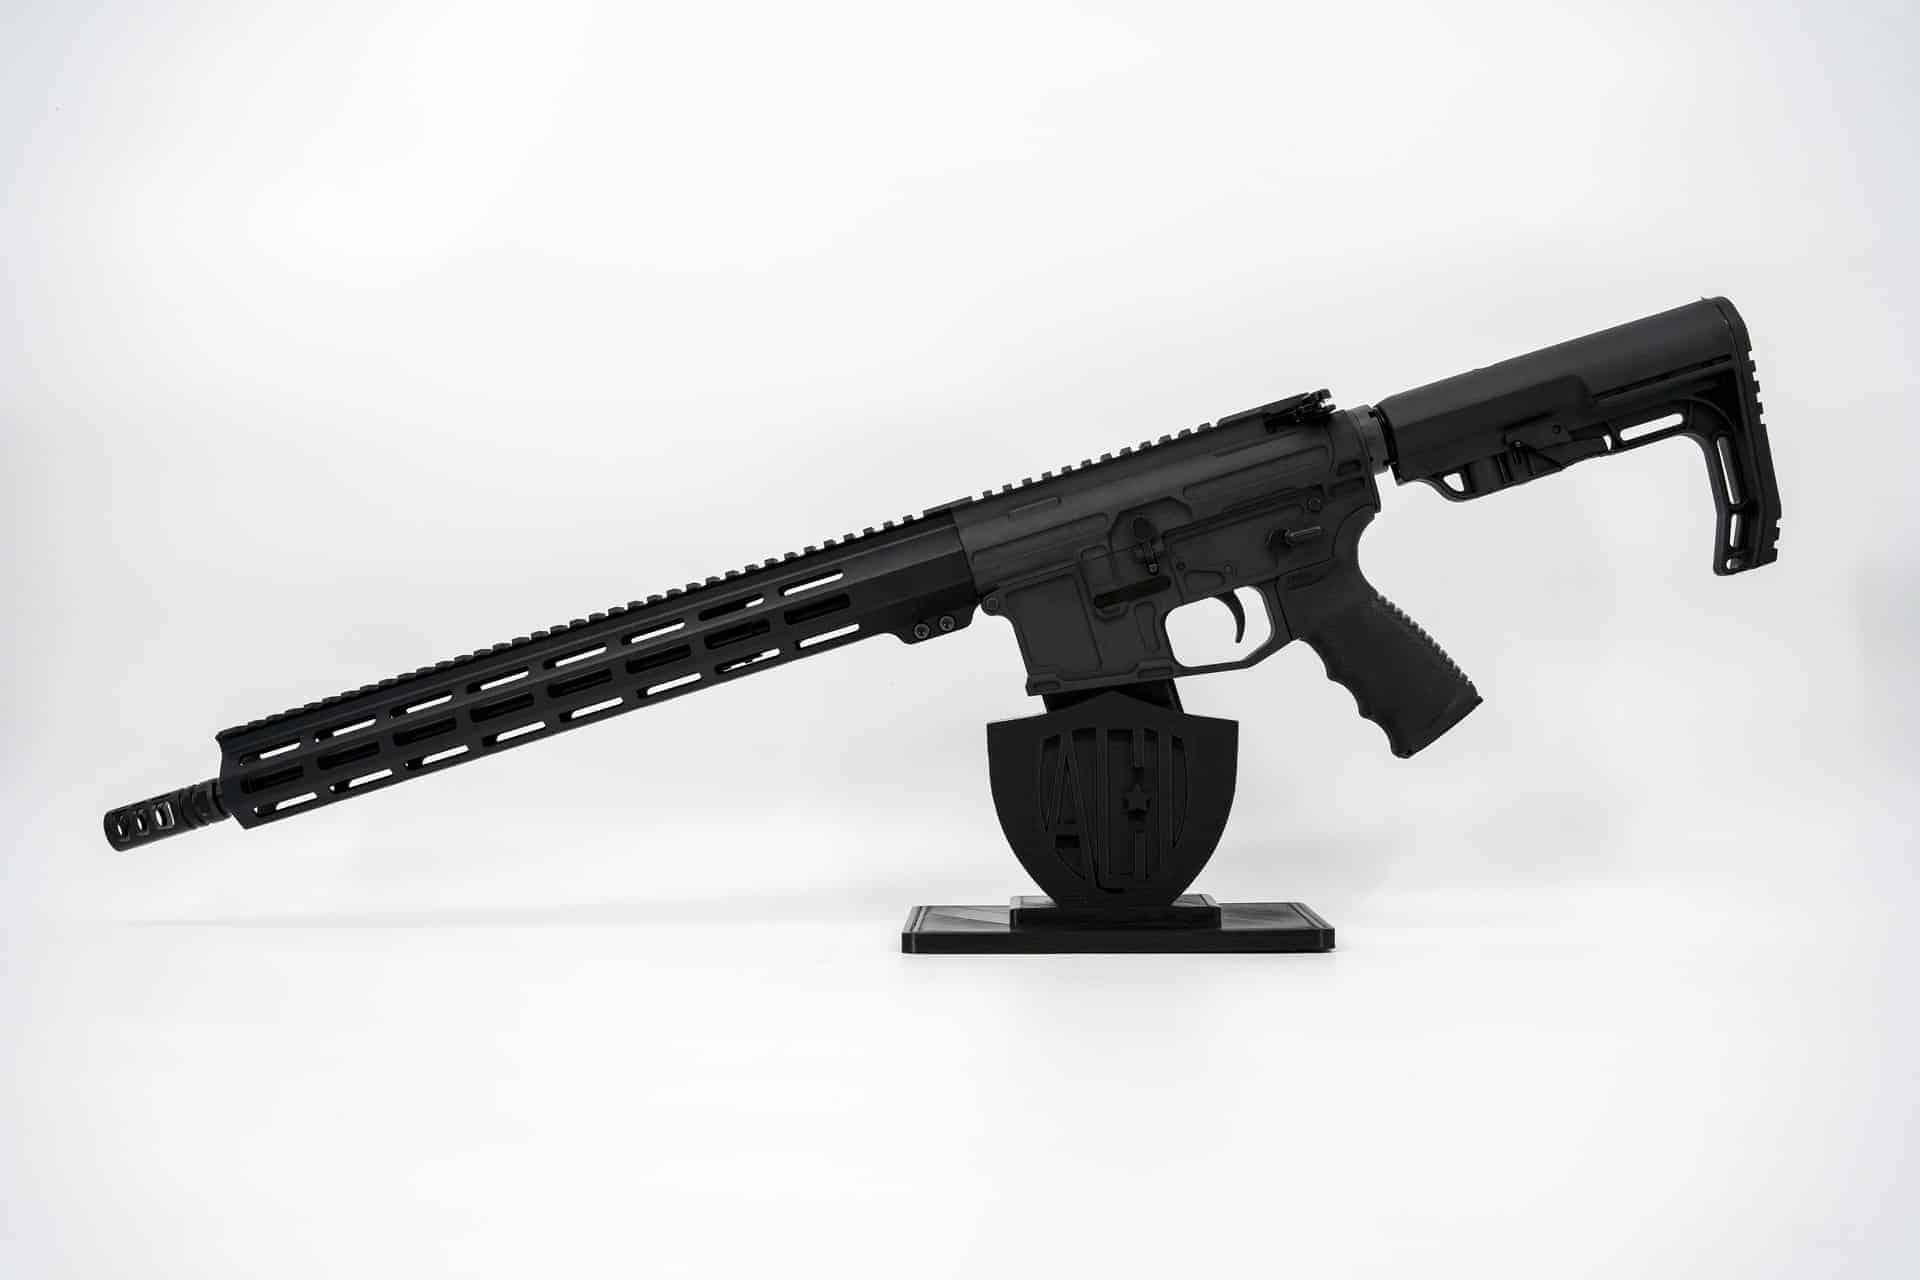 rifle 300 blackout ar15 10.5 inch MLOK SBA3 Andro Corp AR15 Pistol